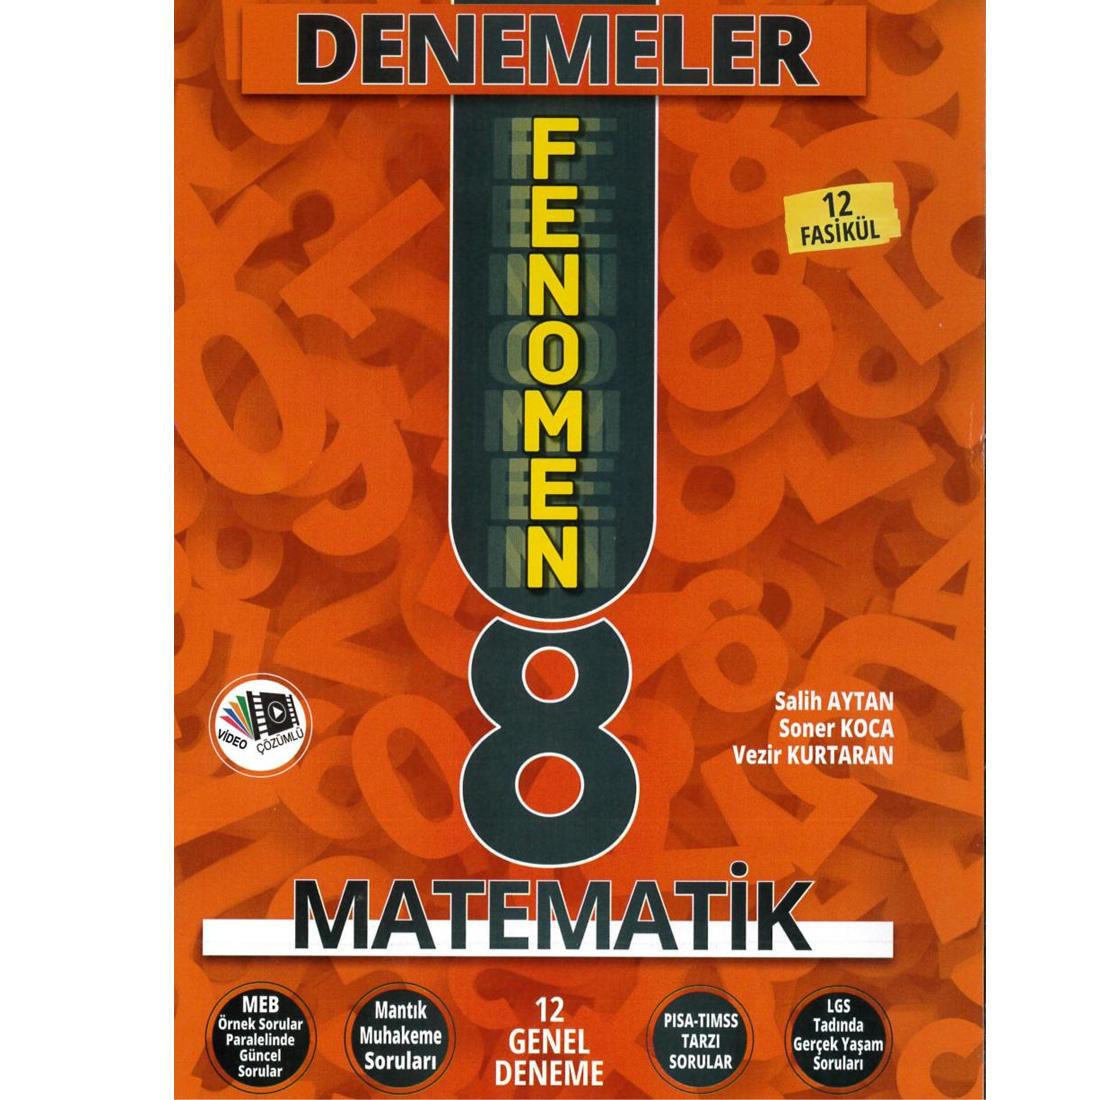 Fenomen 8.Sınıf Matematik Dnm